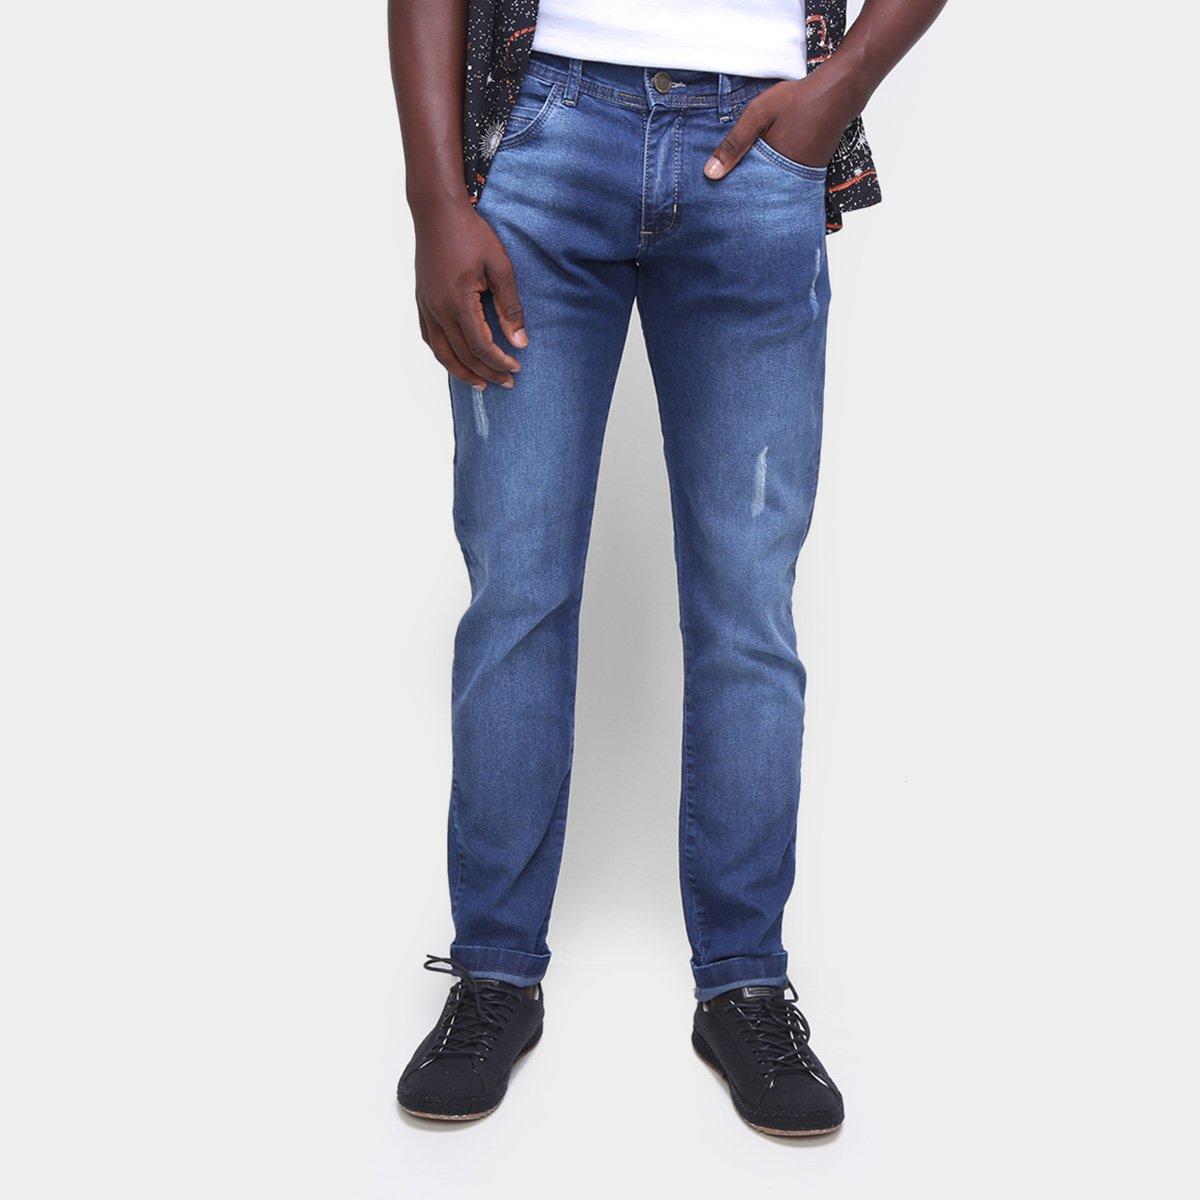 Calça Jeans Coffee Skinny Puídos Masculina